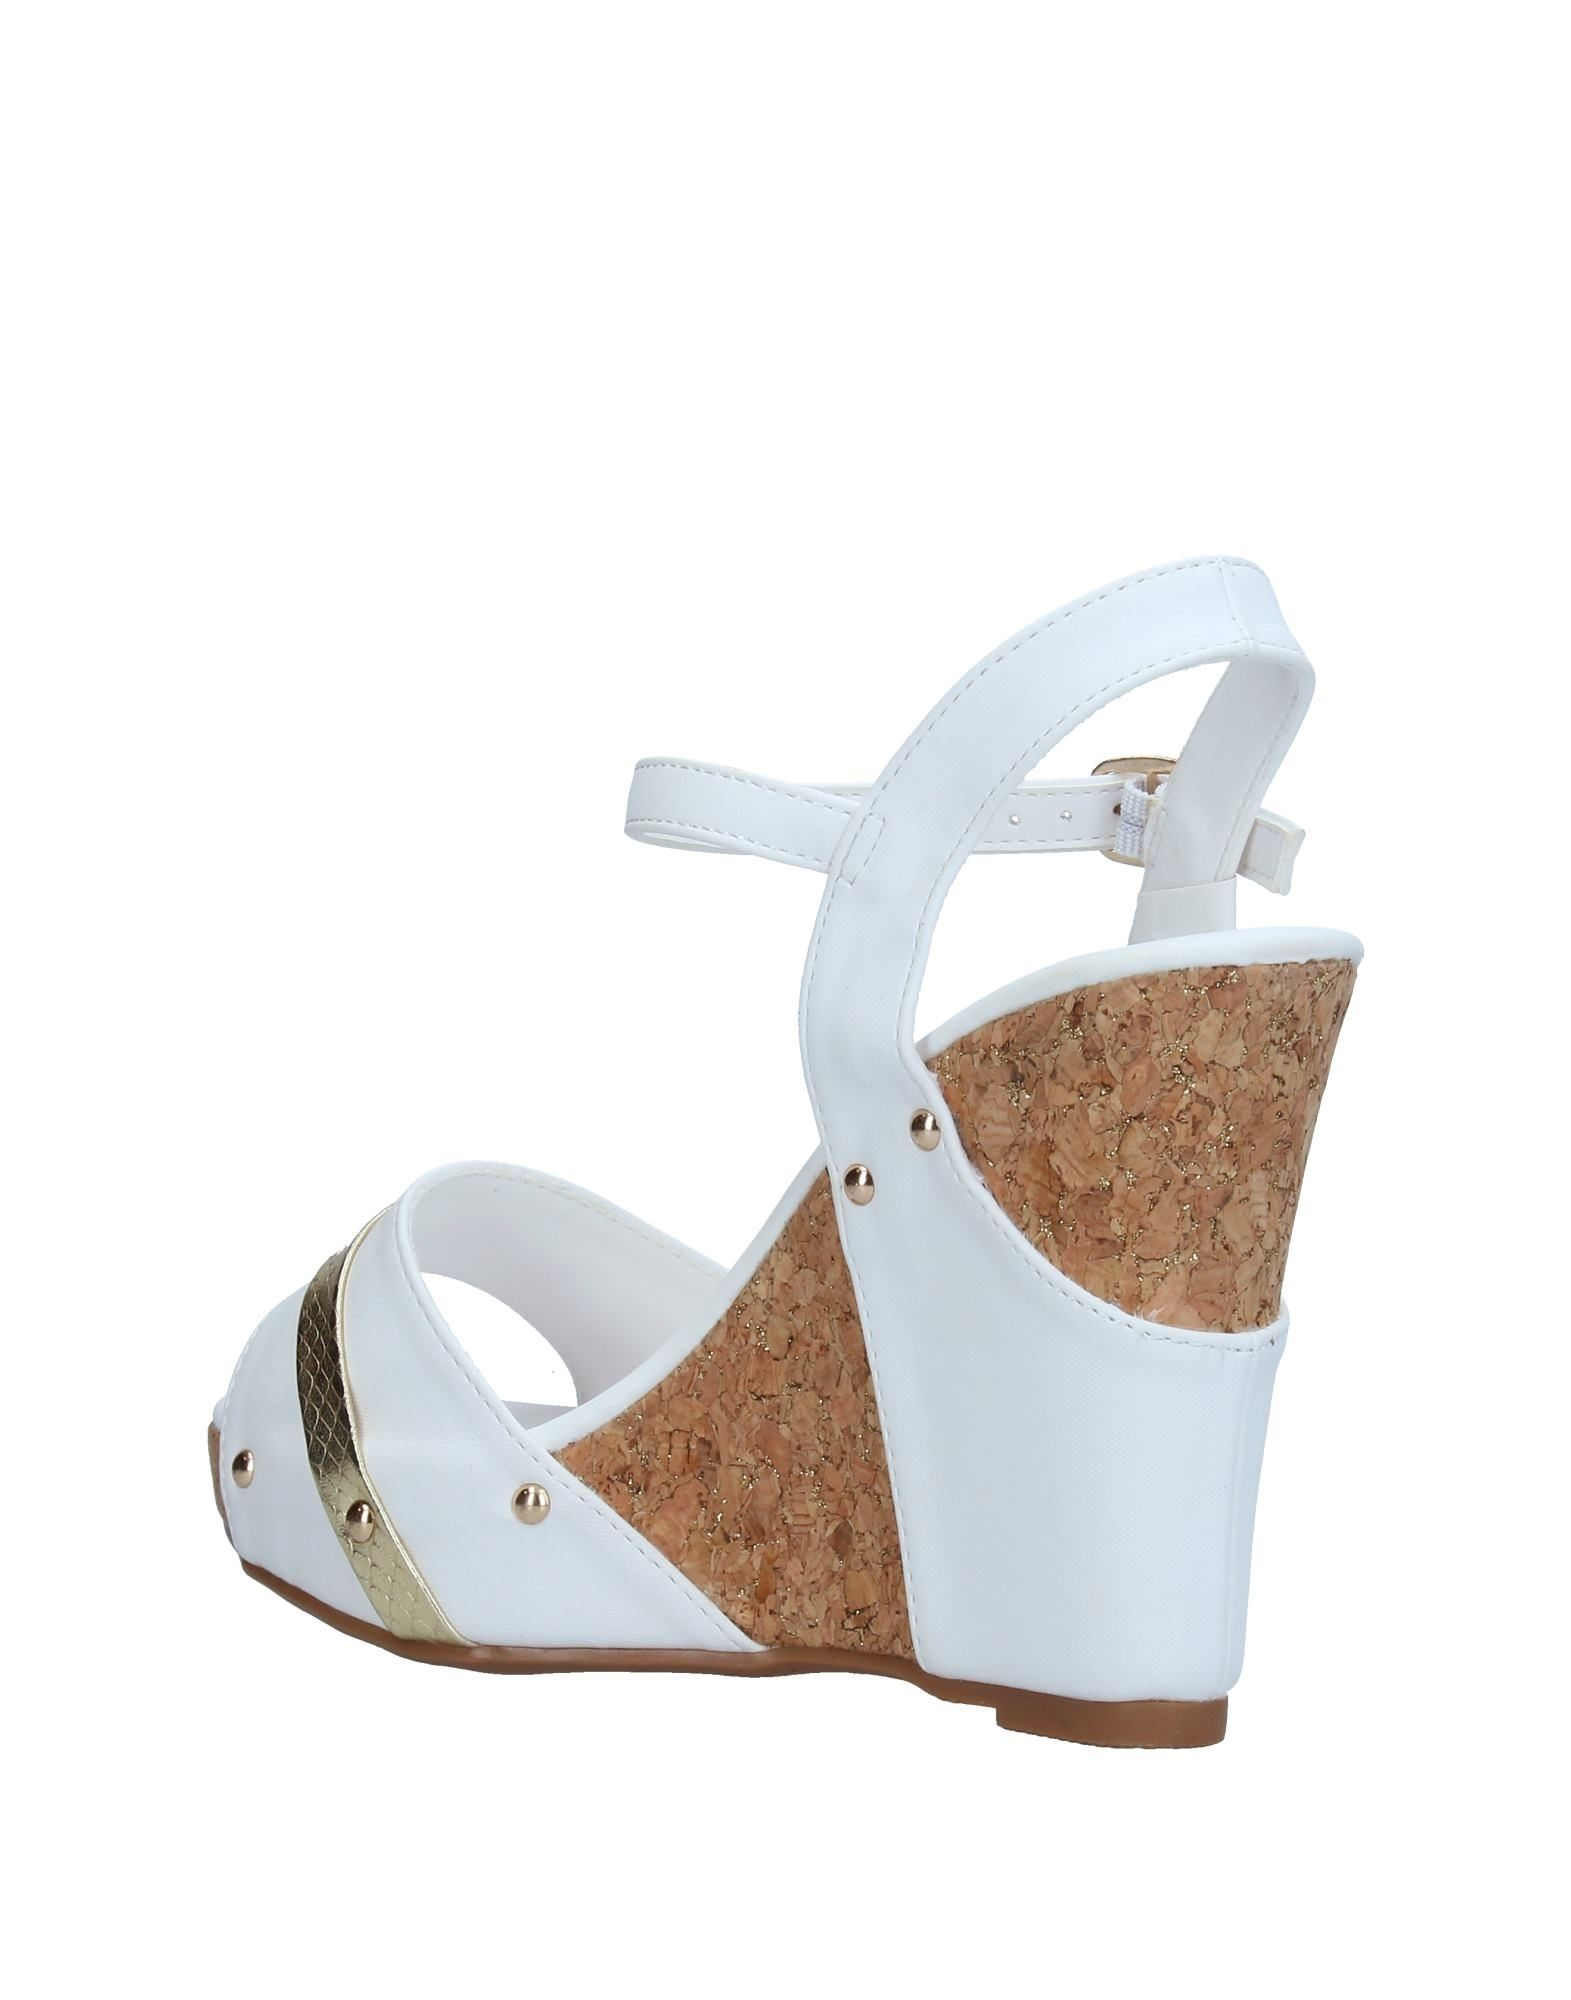 Laura Biagiotti Sandalen 11373529HX Damen  11373529HX Sandalen Neue Schuhe acdd2f